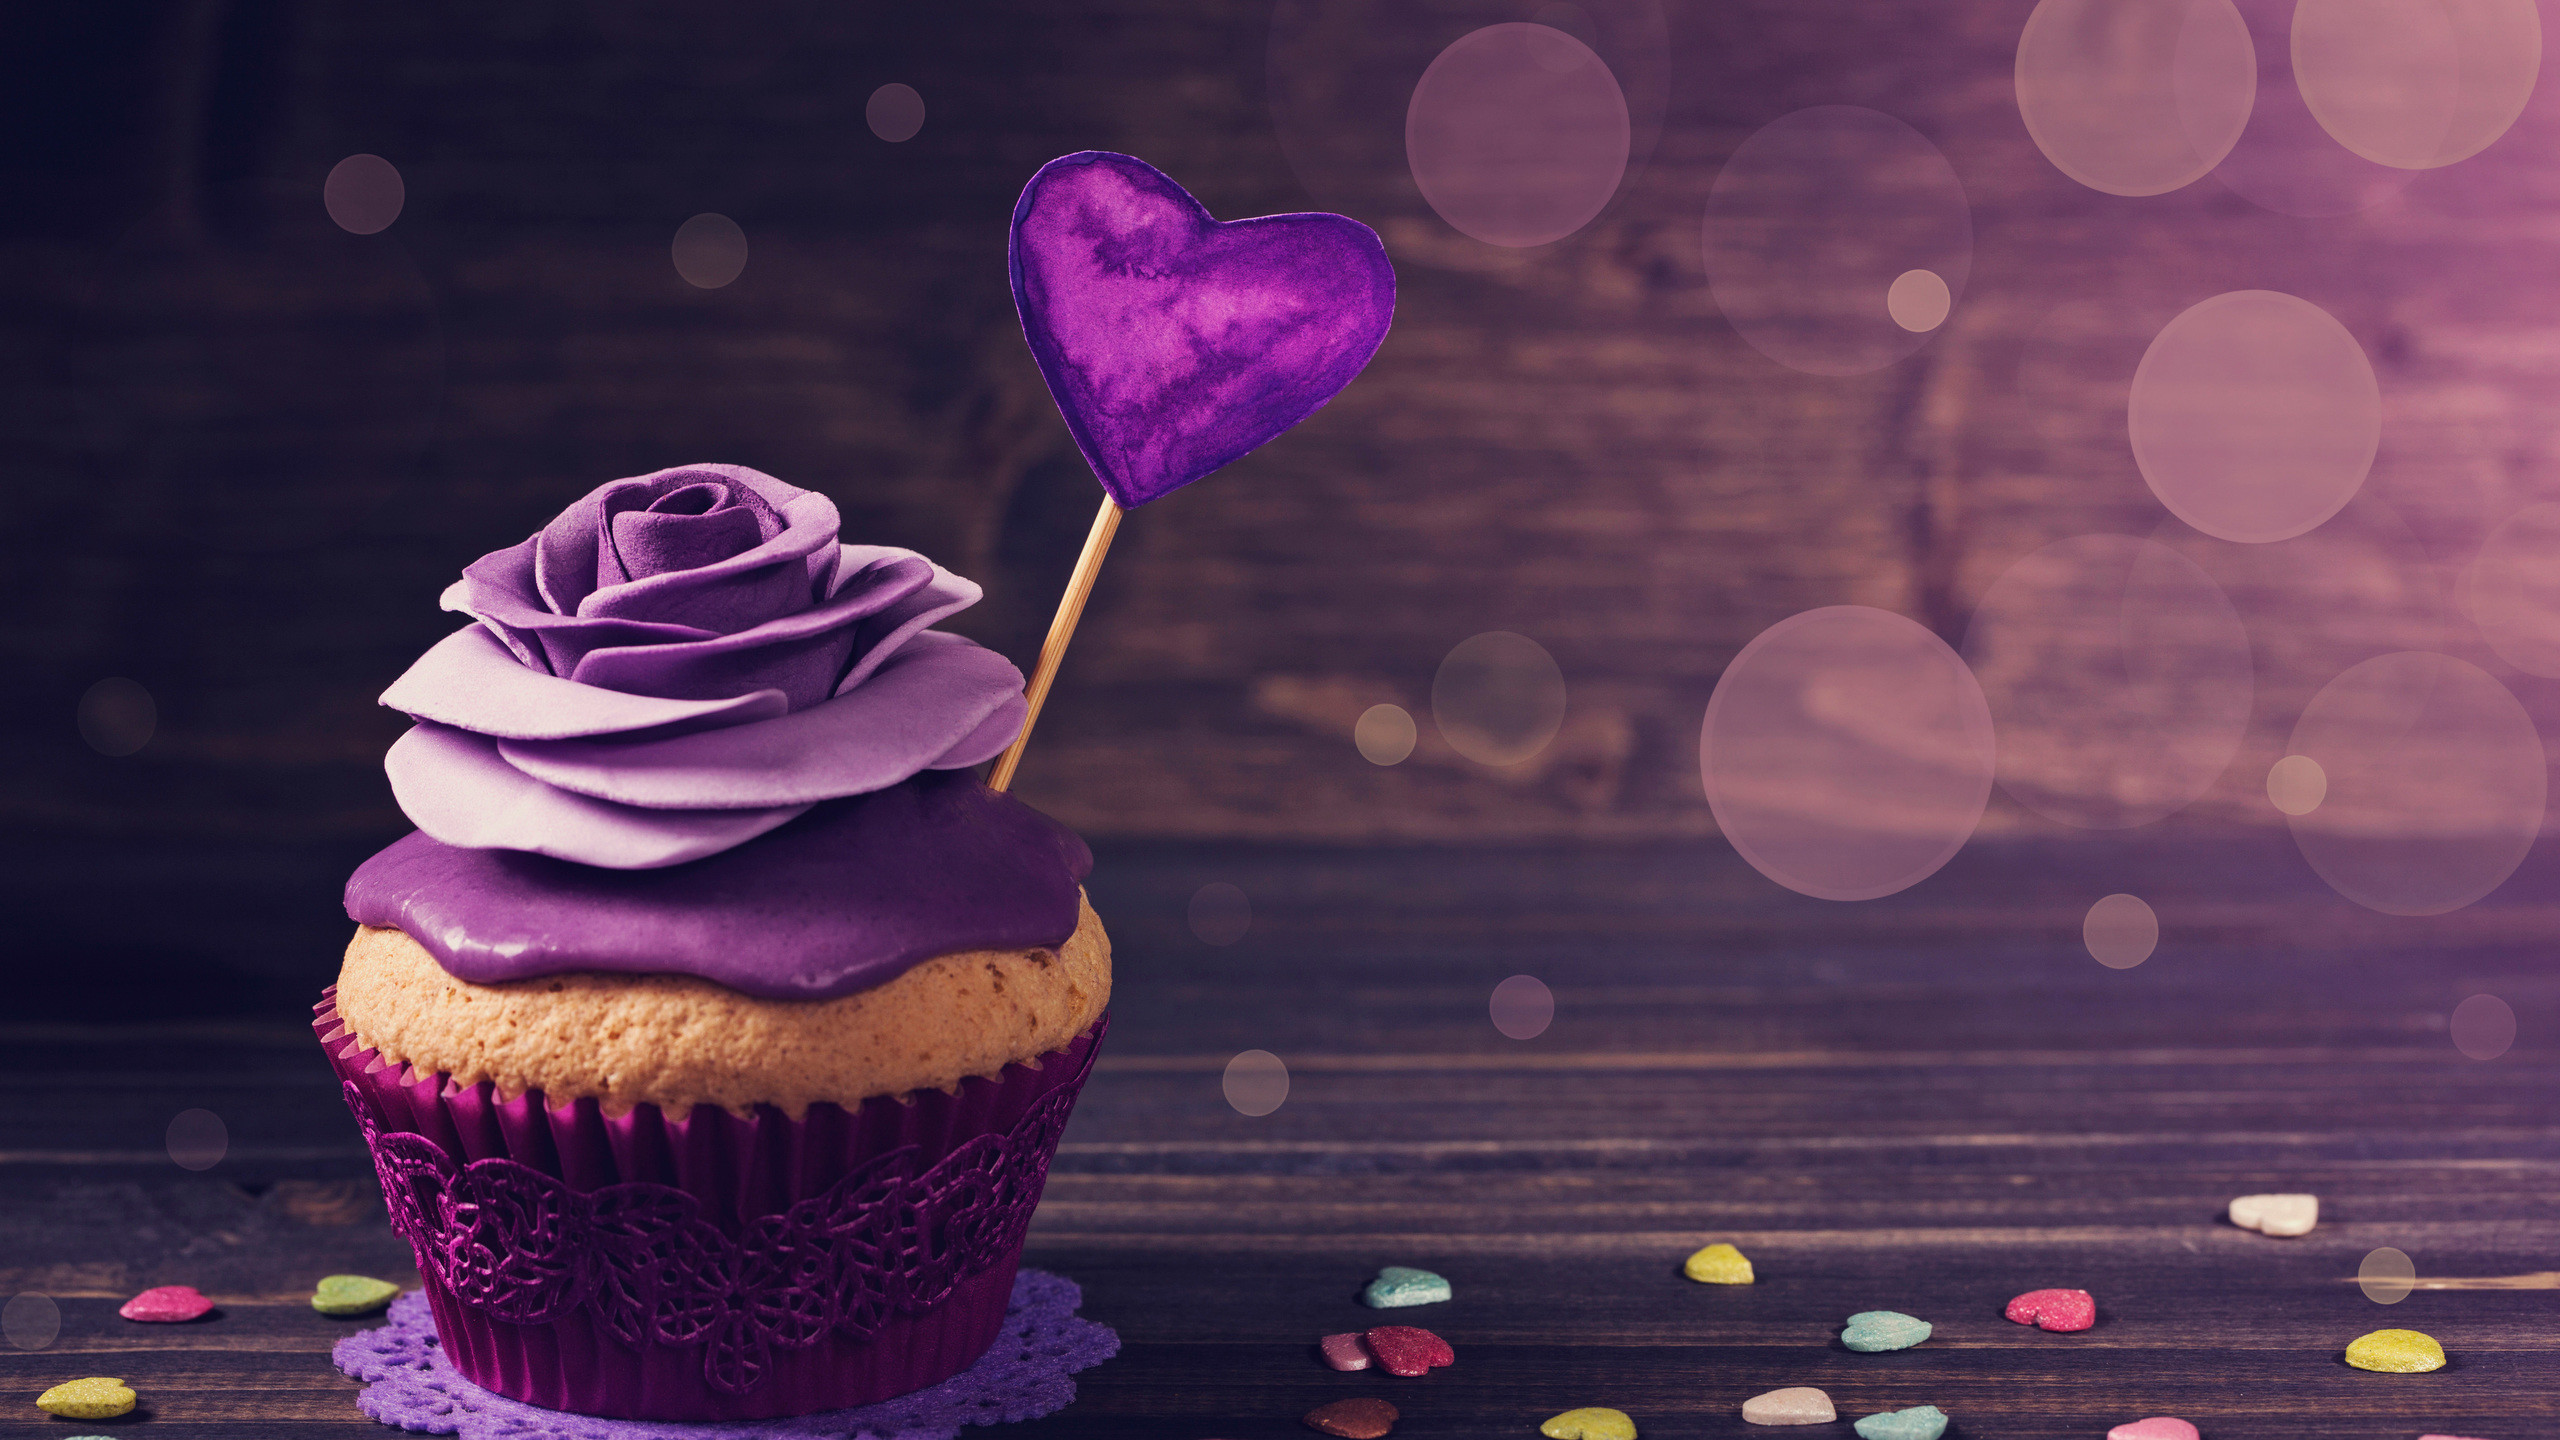 Res: 2560x1440, roses-cupcake-z2.jpg